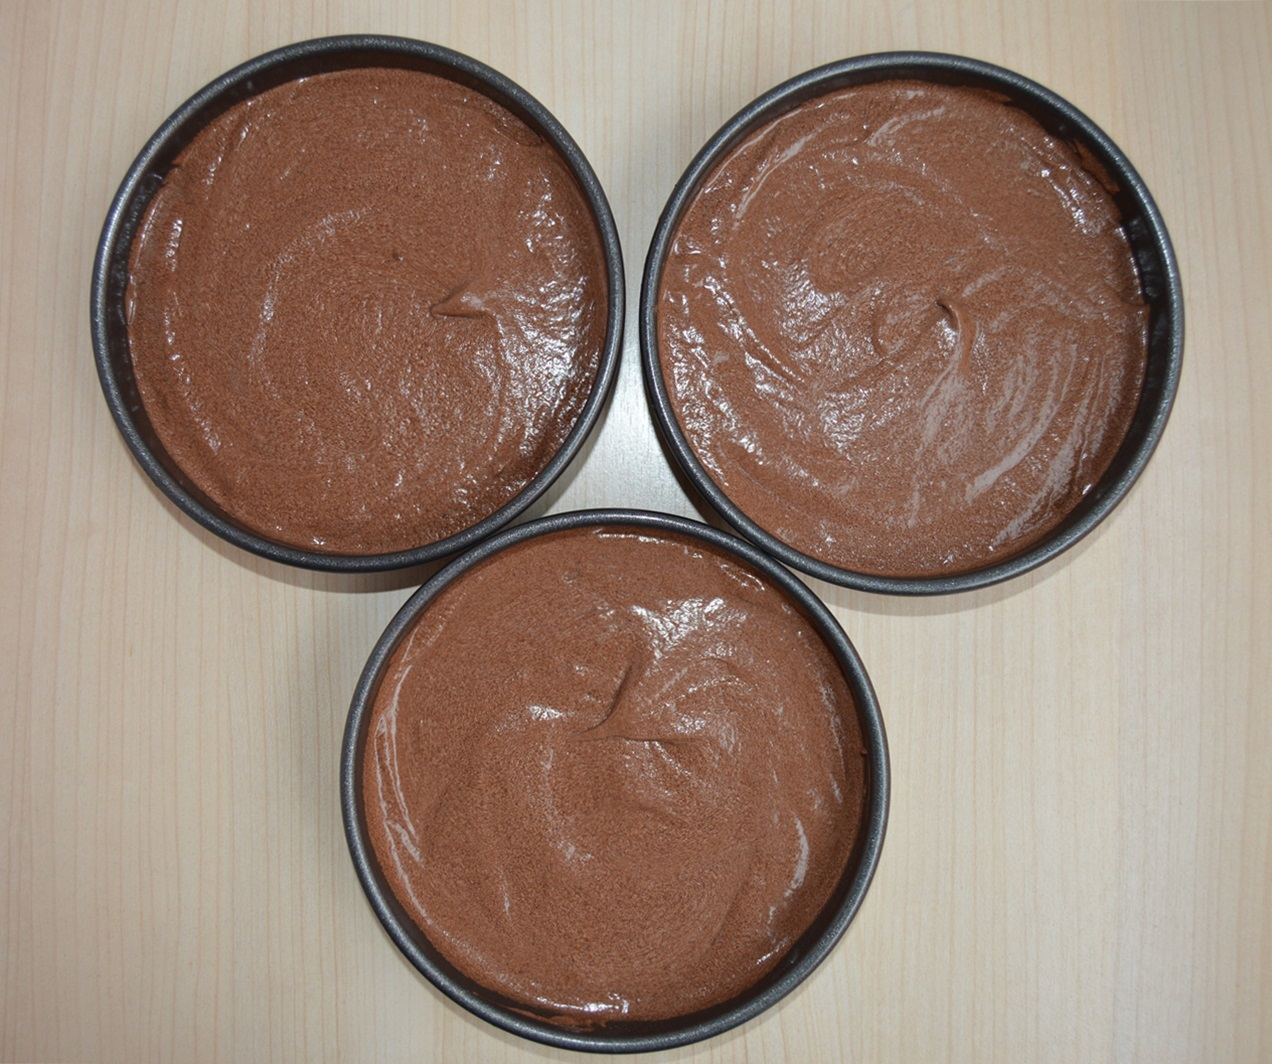 Masa tarta chocolate y caramelo salado en moldes. Aroma de chocolate